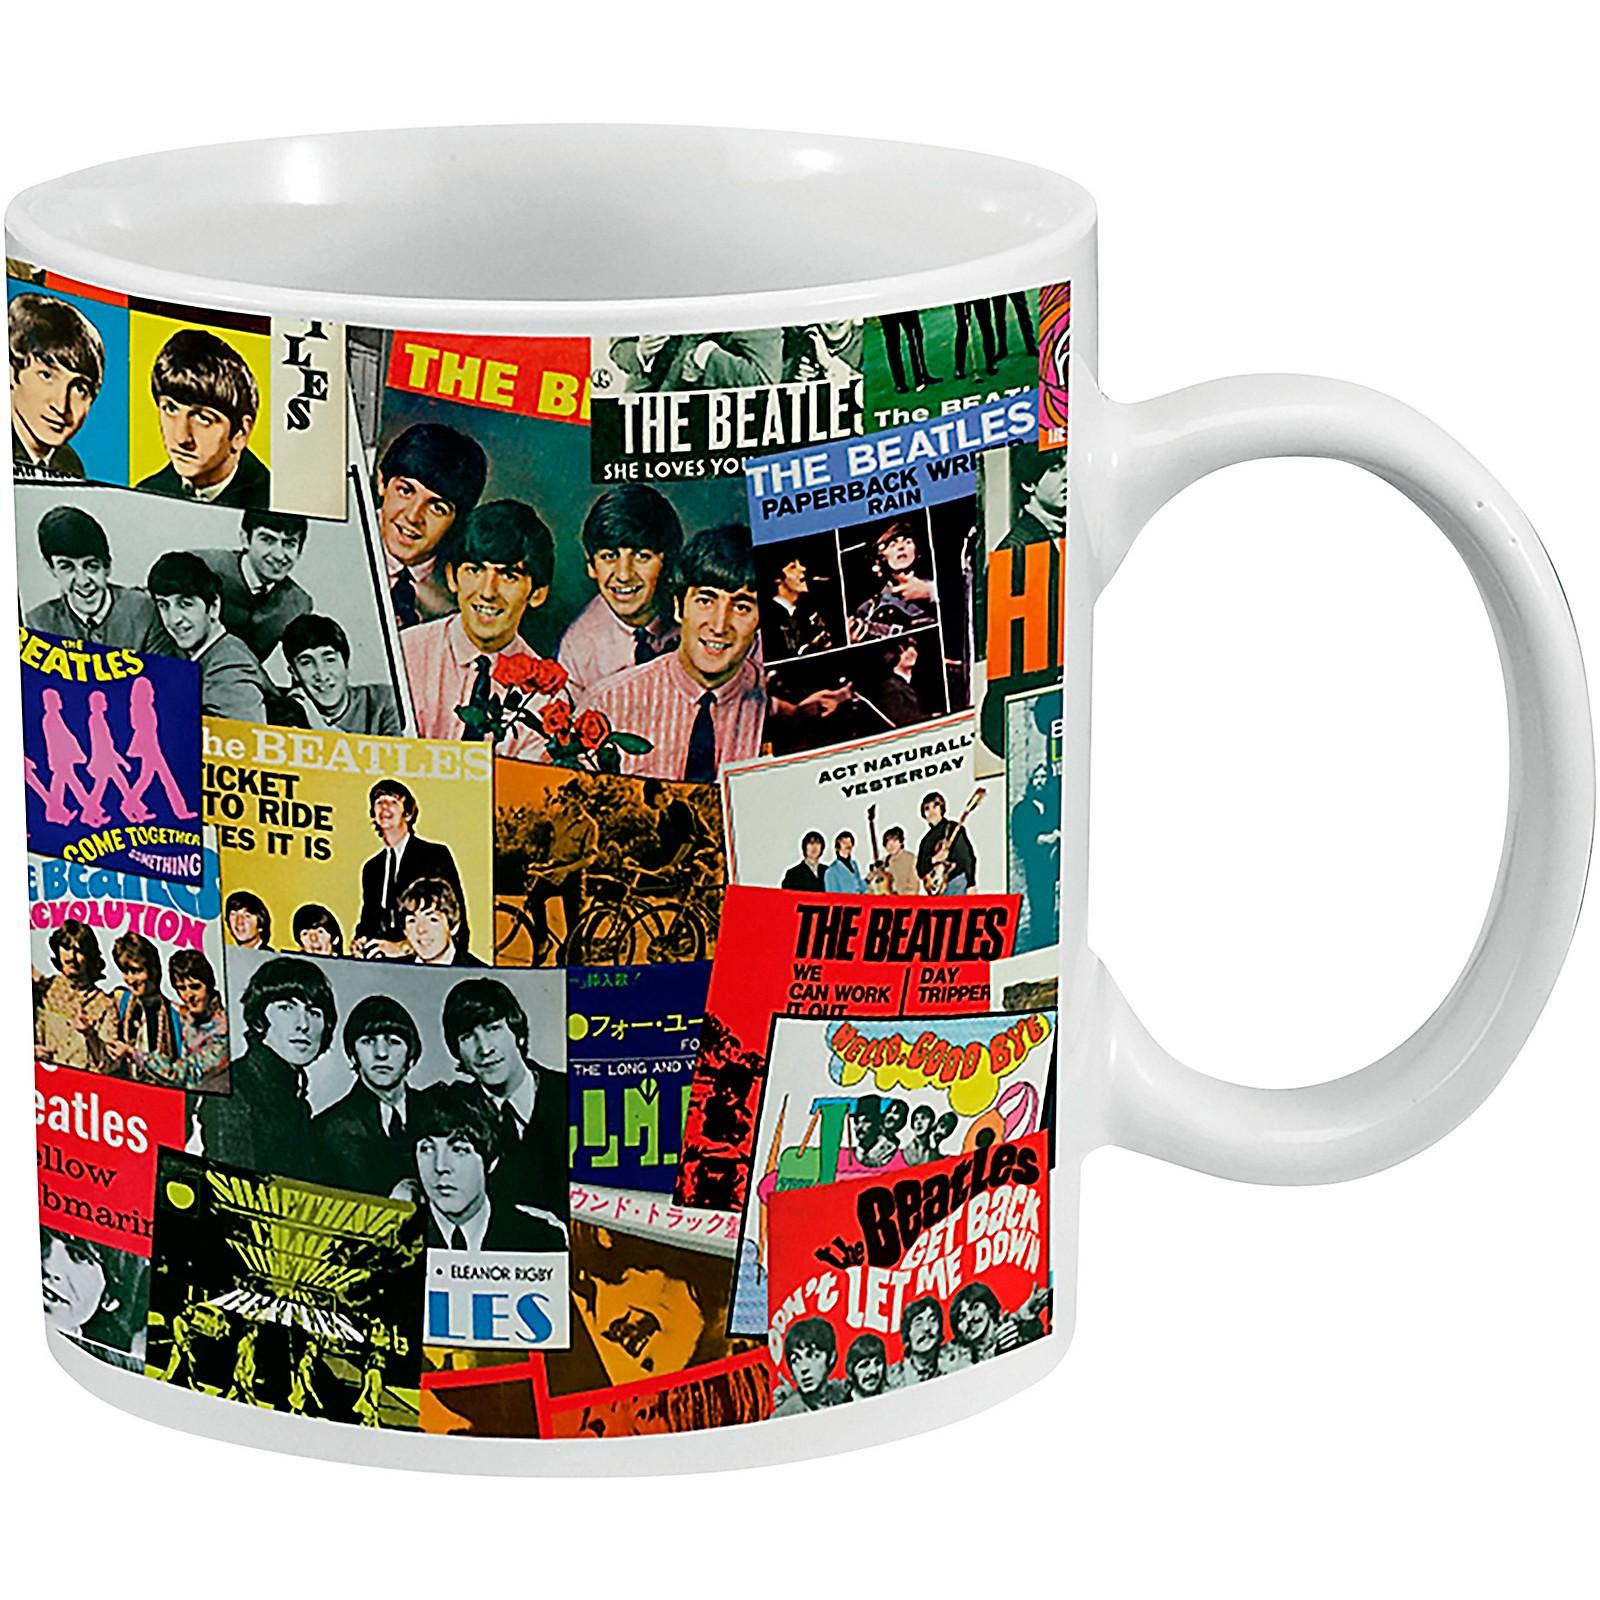 Vandor The Beatles Singles Collection 20 oz. Ceramic Mug